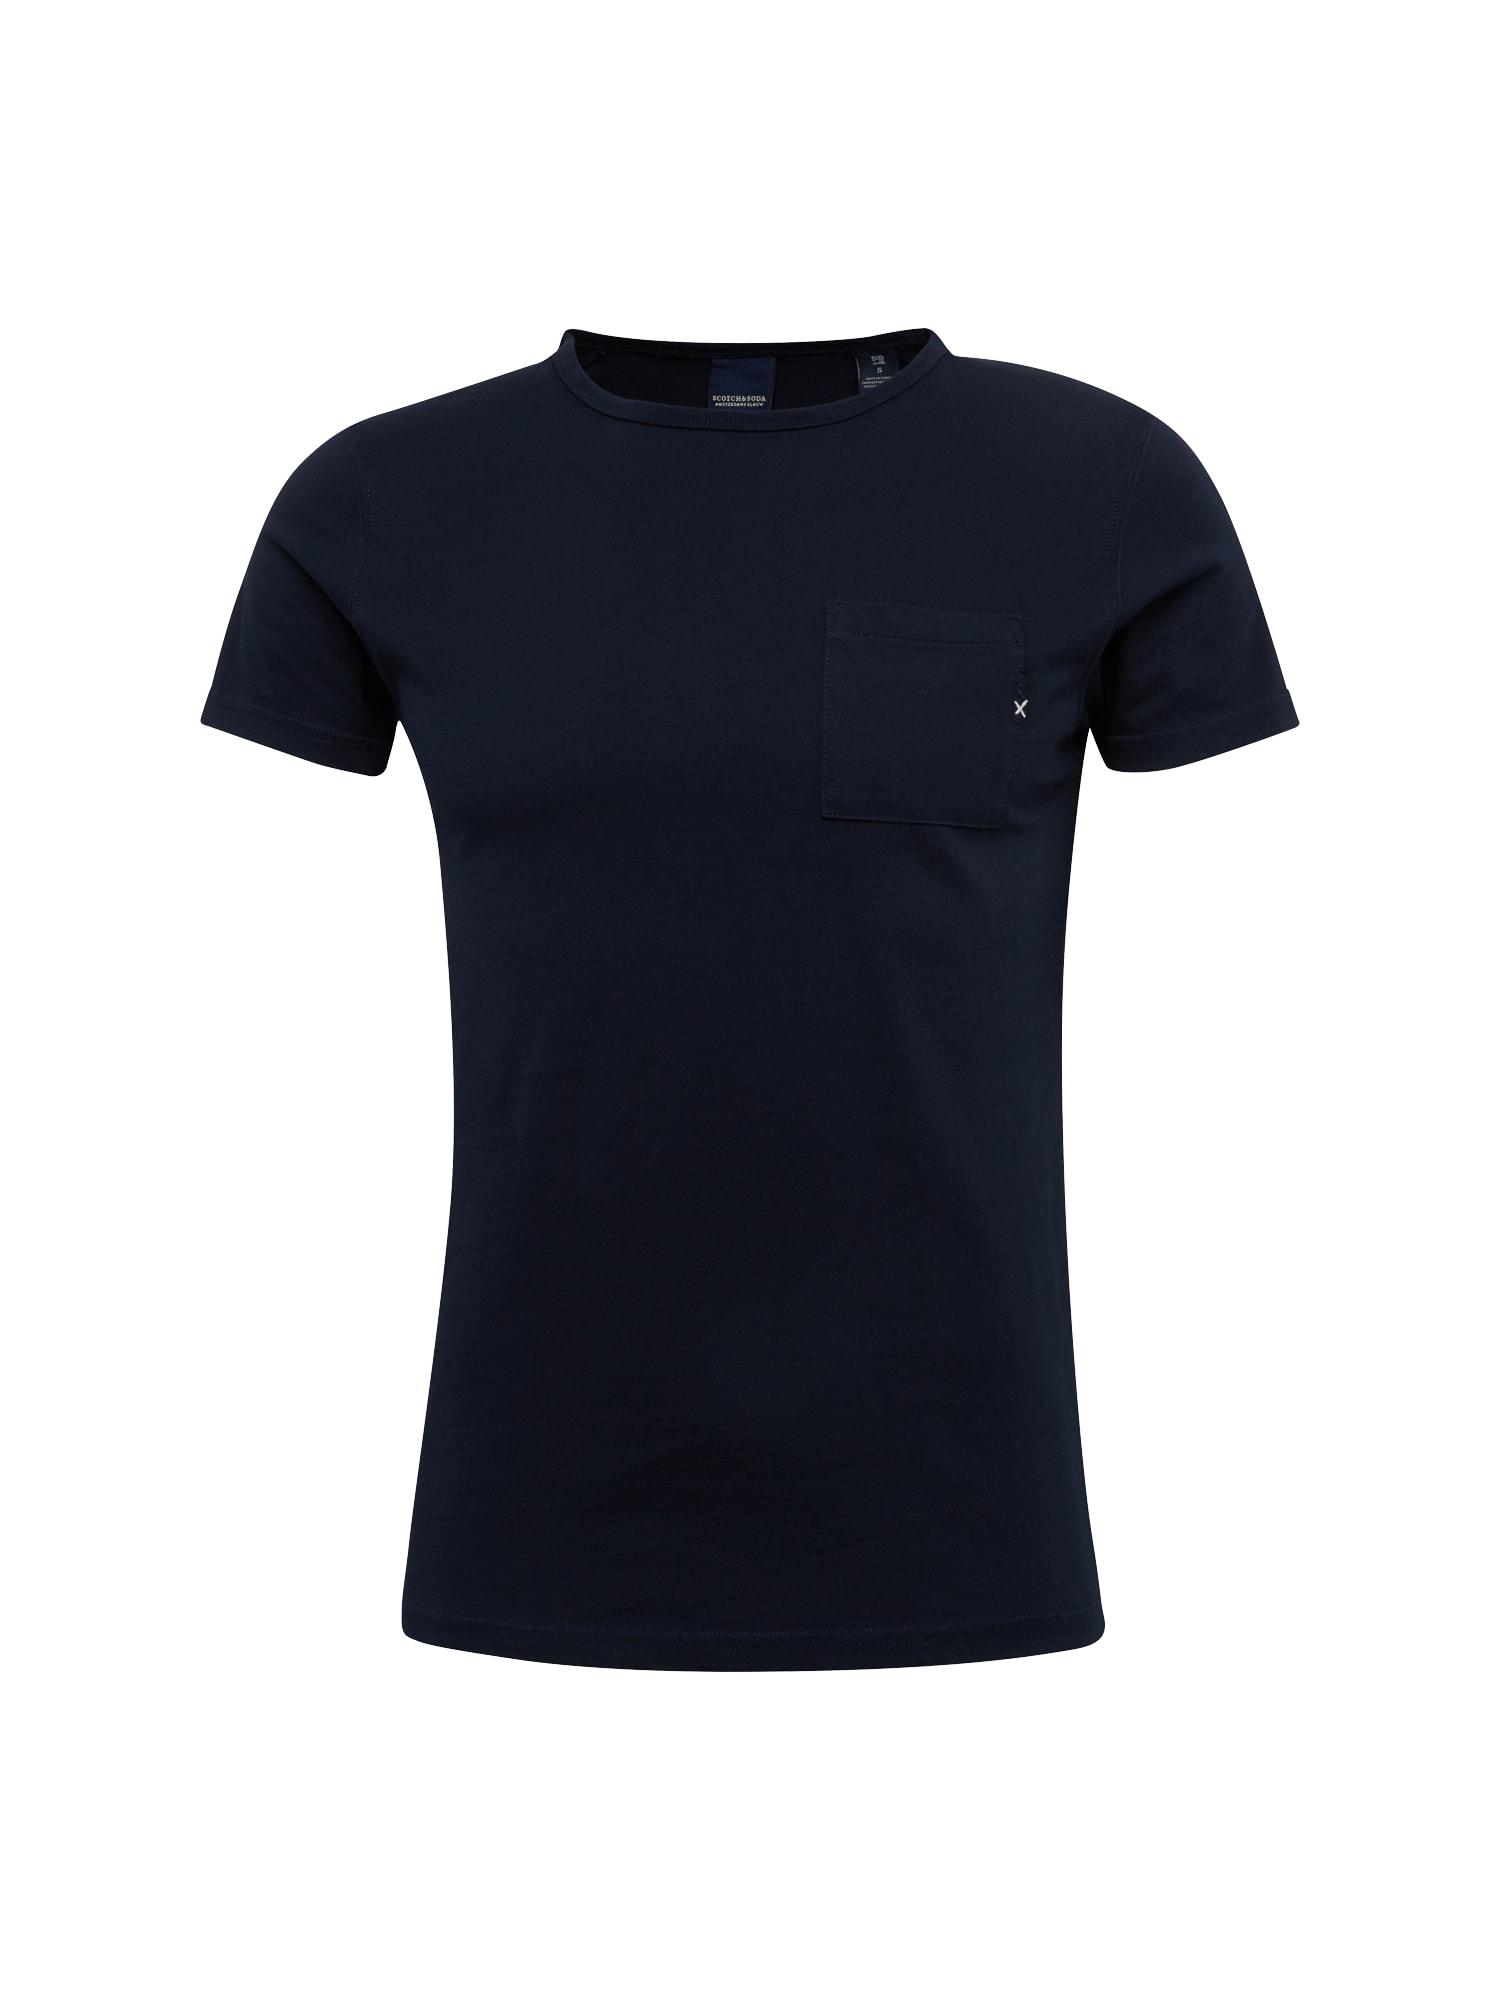 SCOTCH  and  SODA Heren Shirt Ams Blauw 1 pocket tee in seasonal colours navy